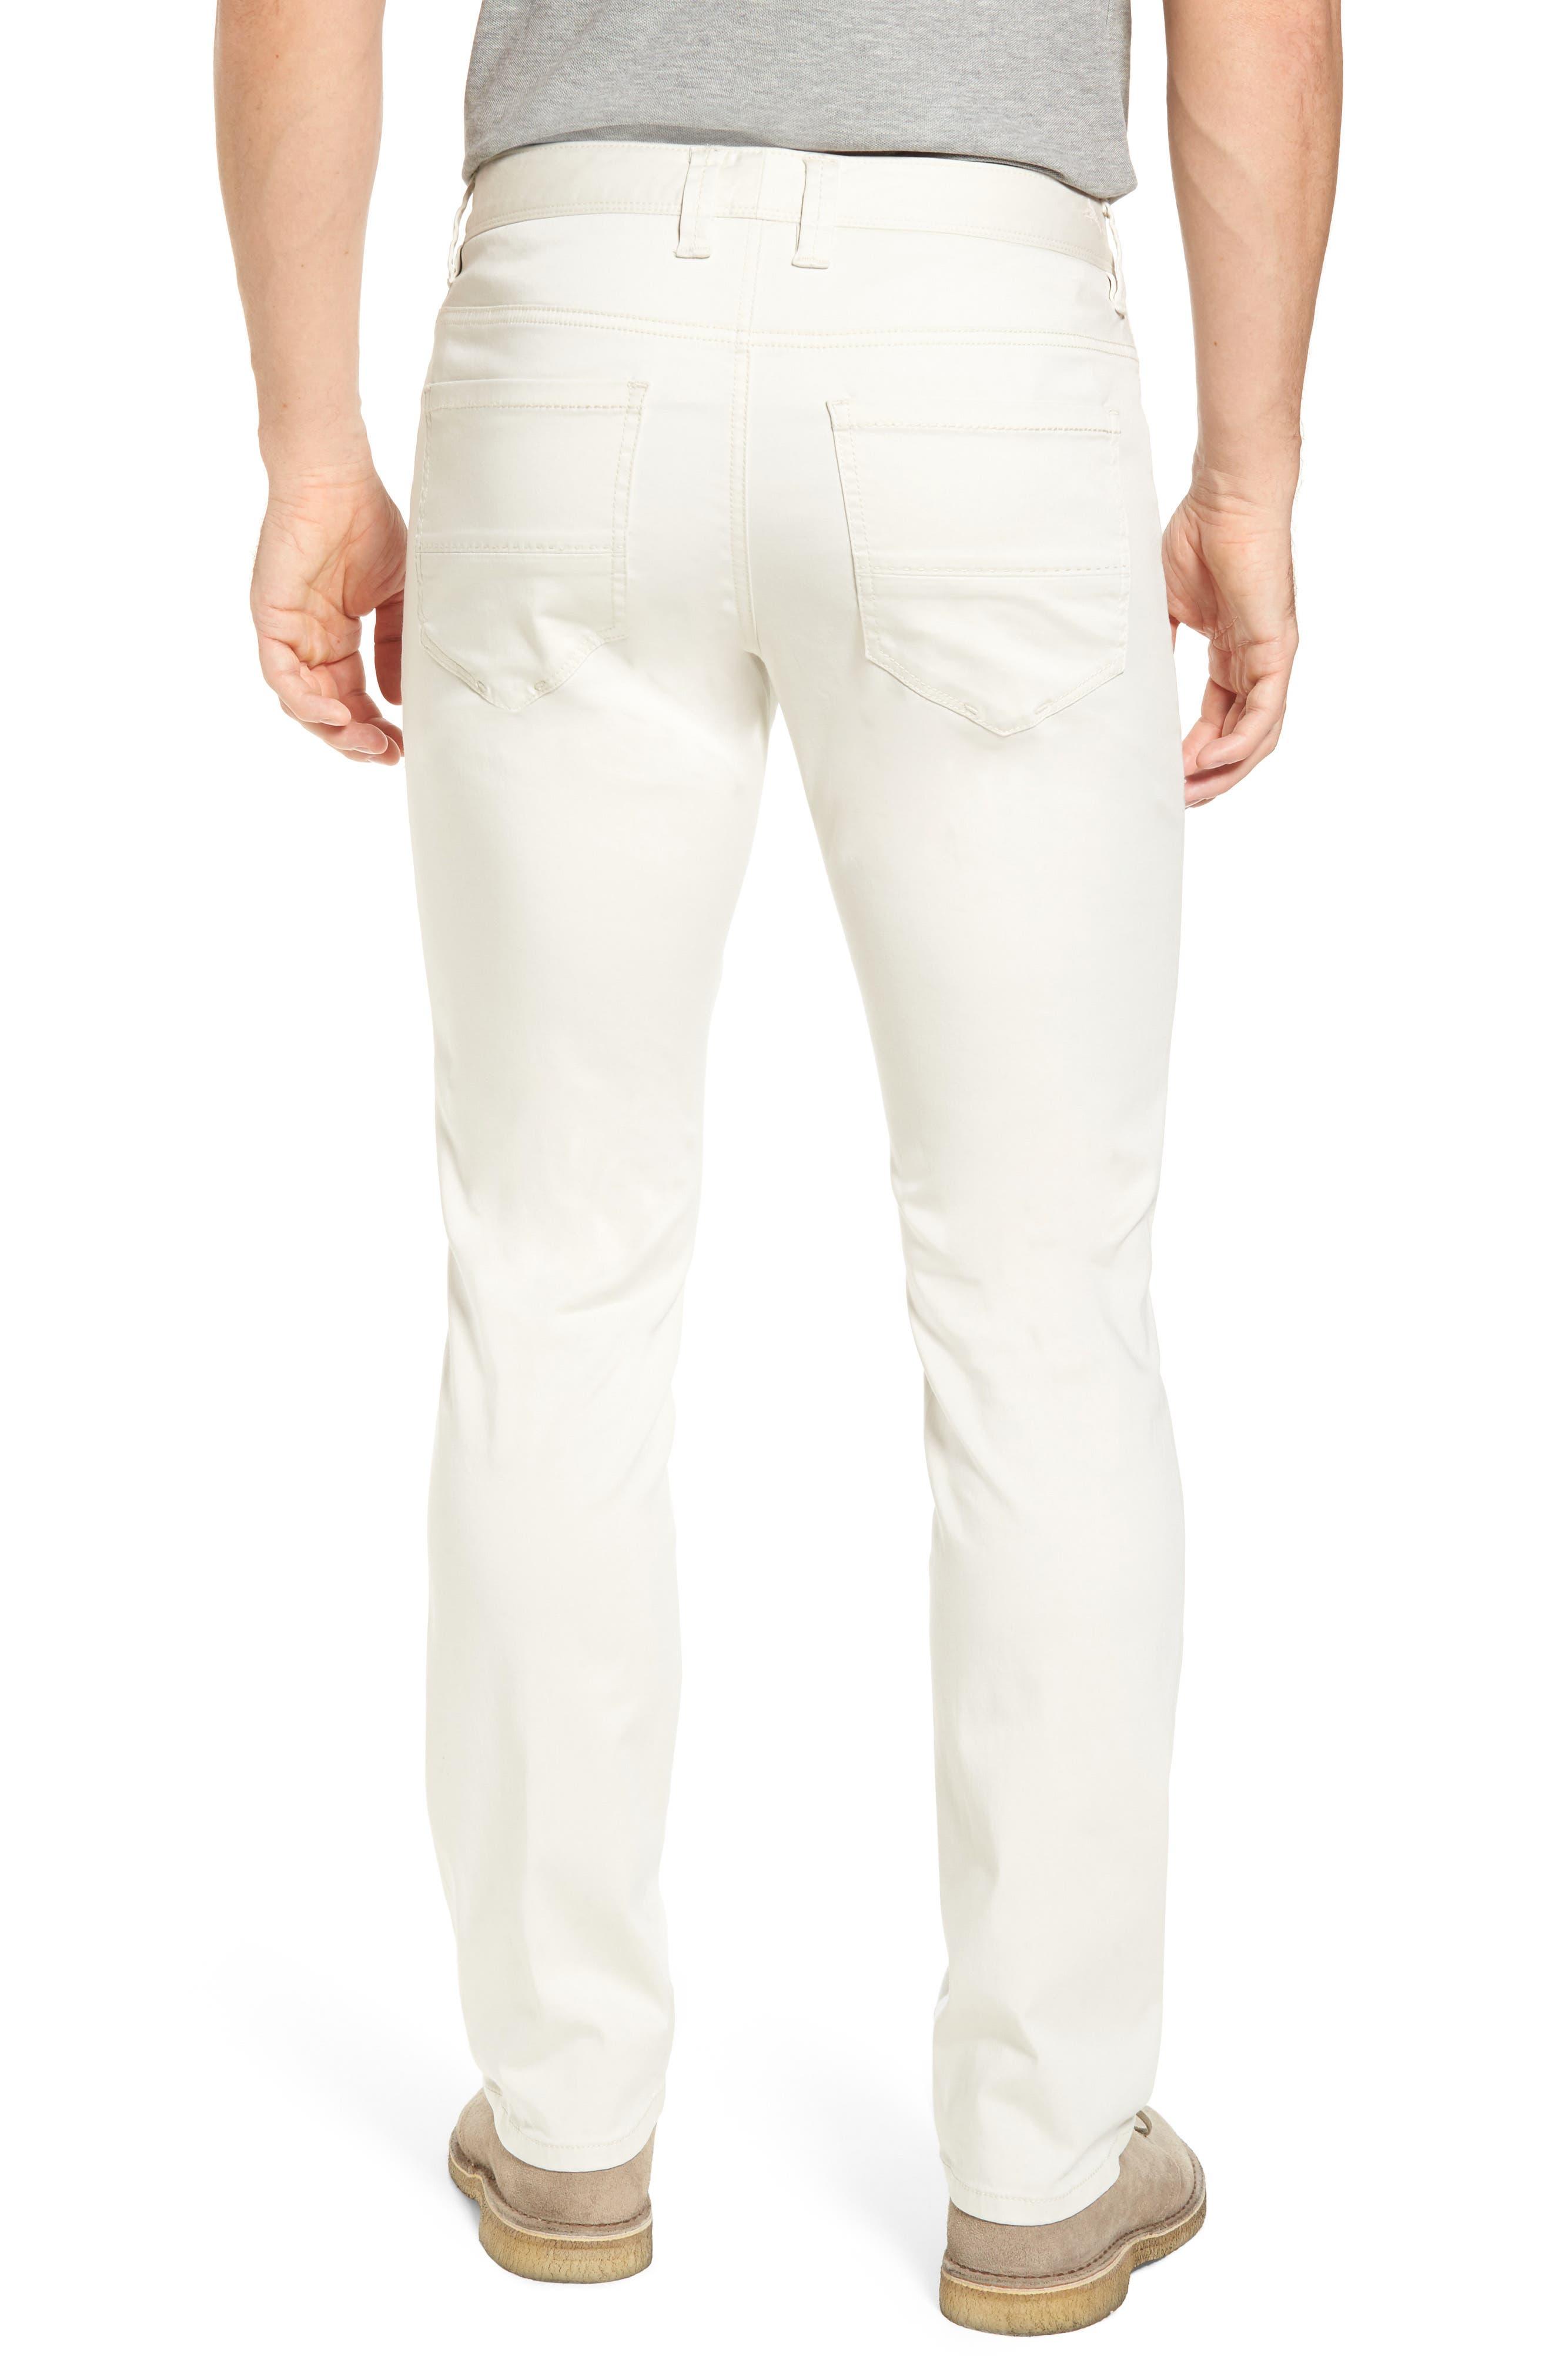 Boracay Pants,                             Alternate thumbnail 5, color,